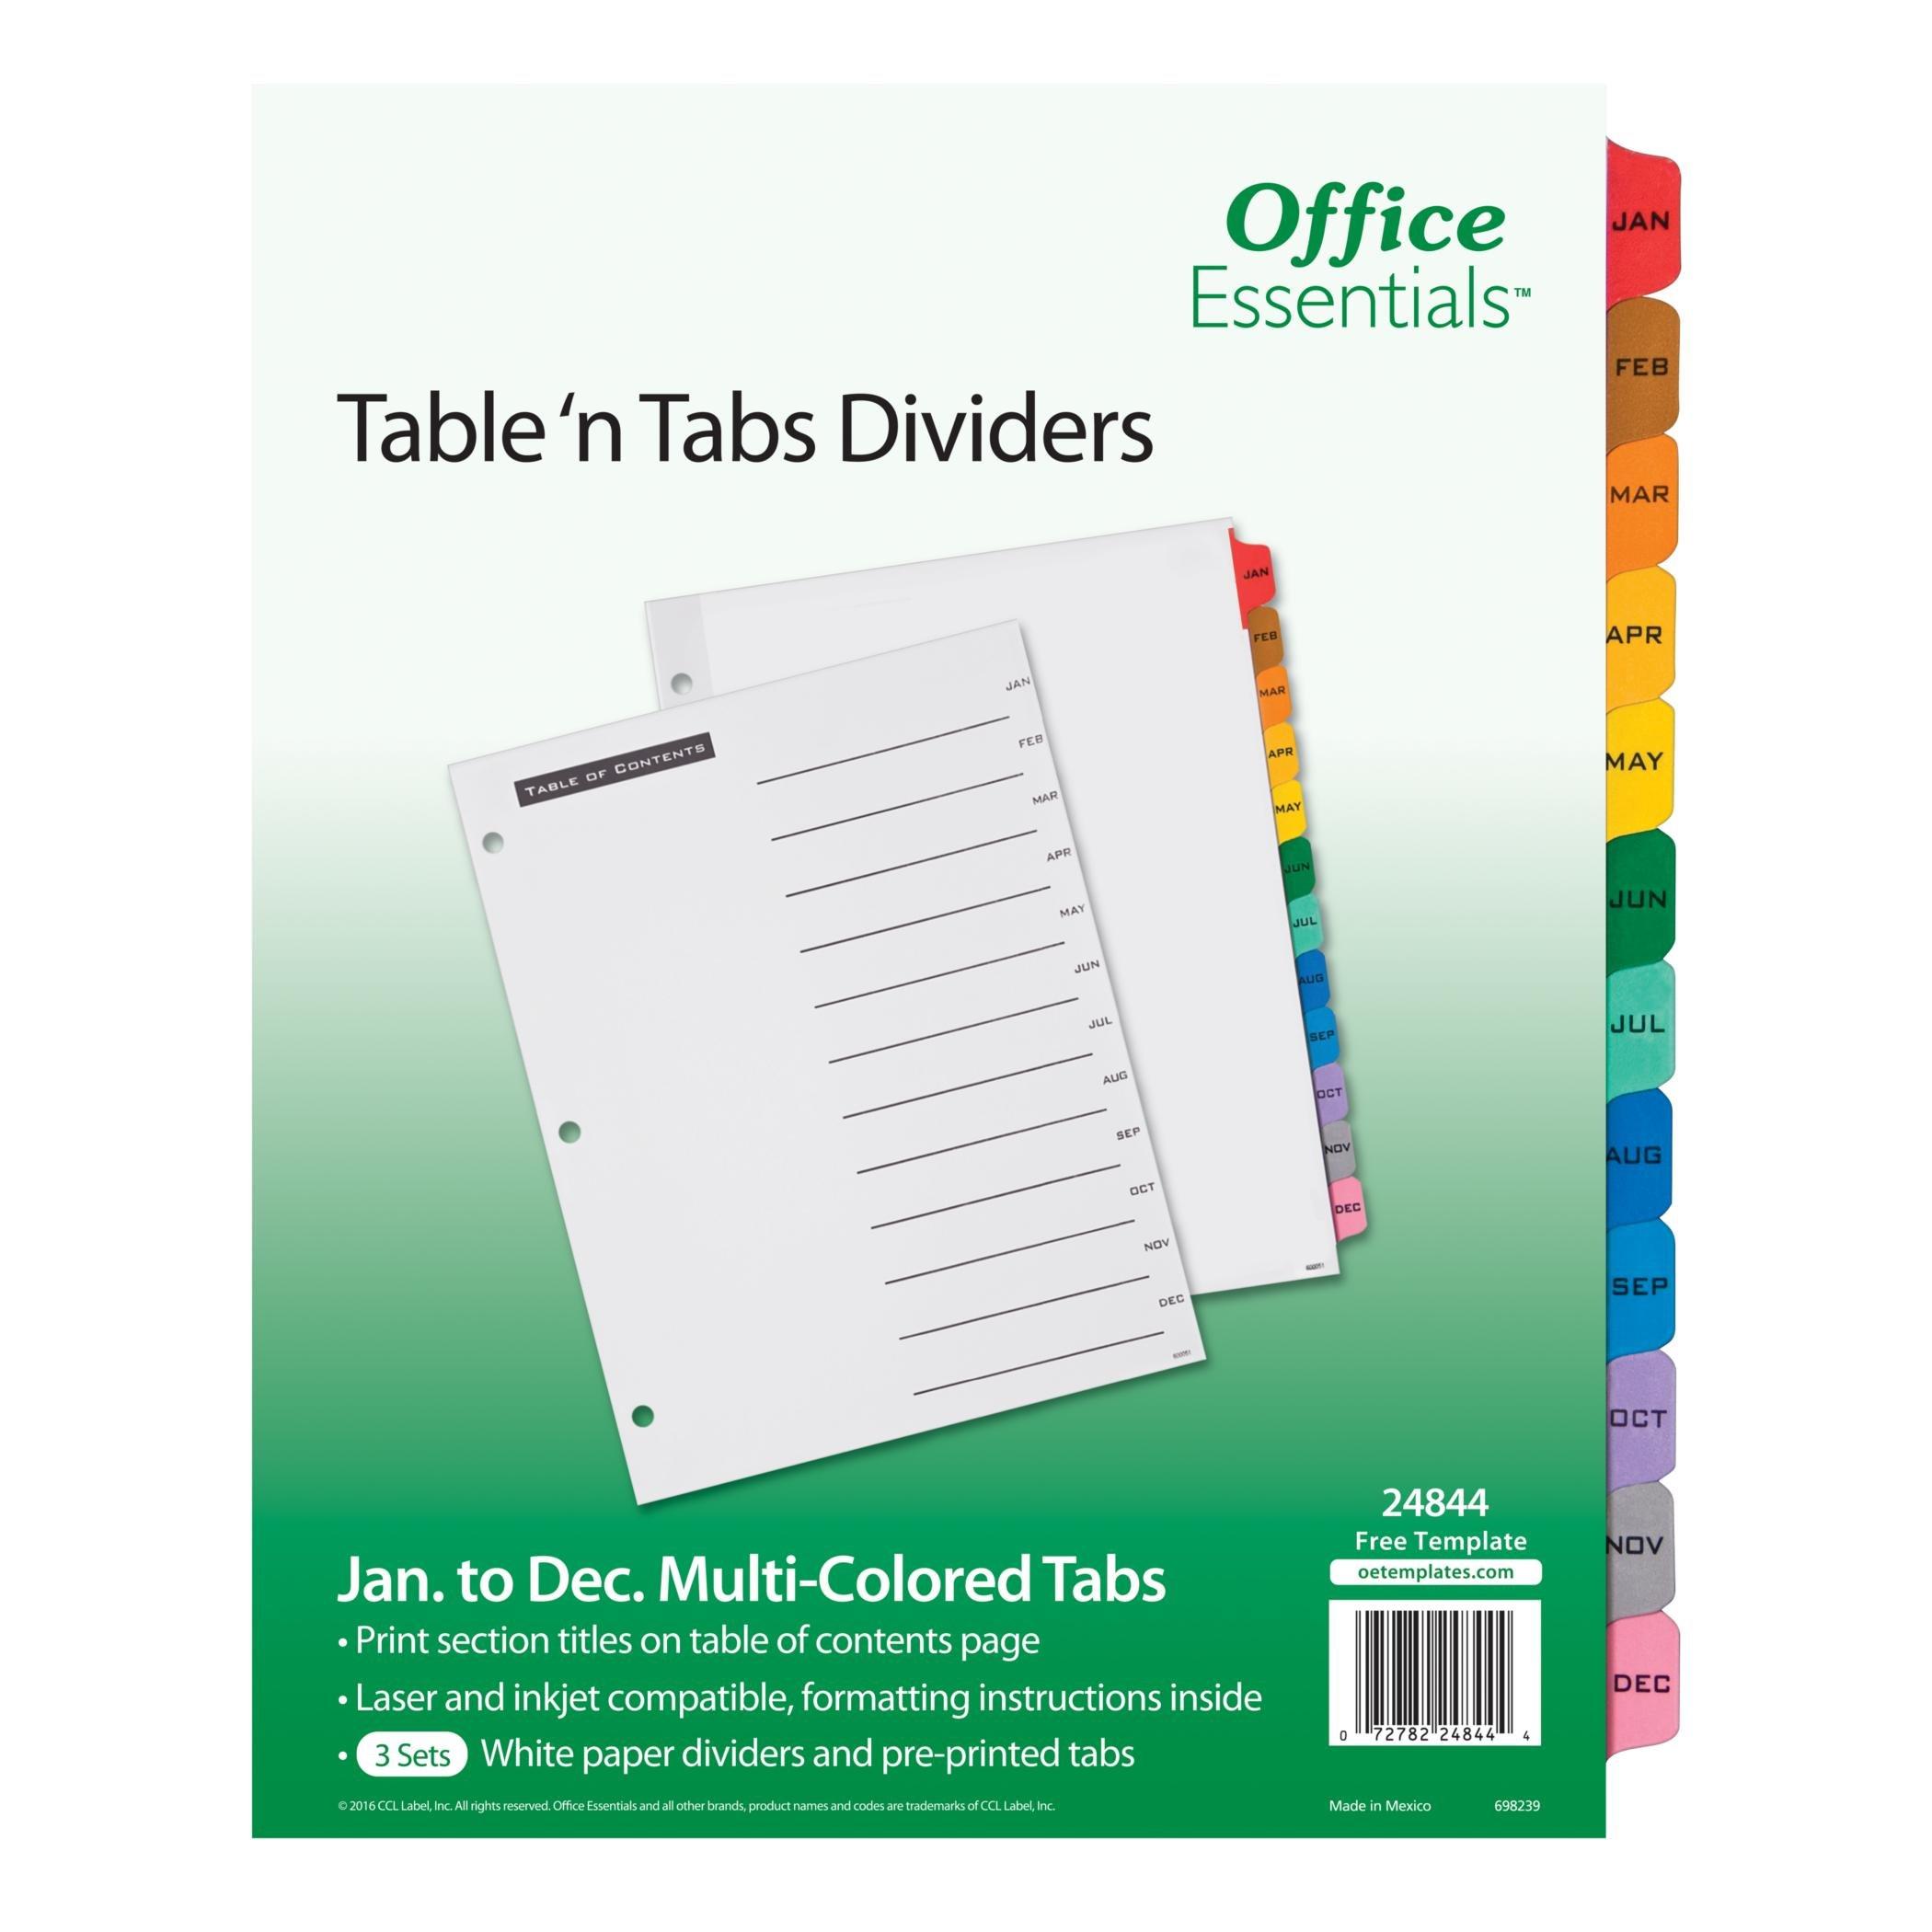 Office Essentials Table 'n Tabs Dividers, 8-1/2'' x 11'', Jan-Dec, Multicolor Tab, Laser/Inkjet, 3 Sets (24844)